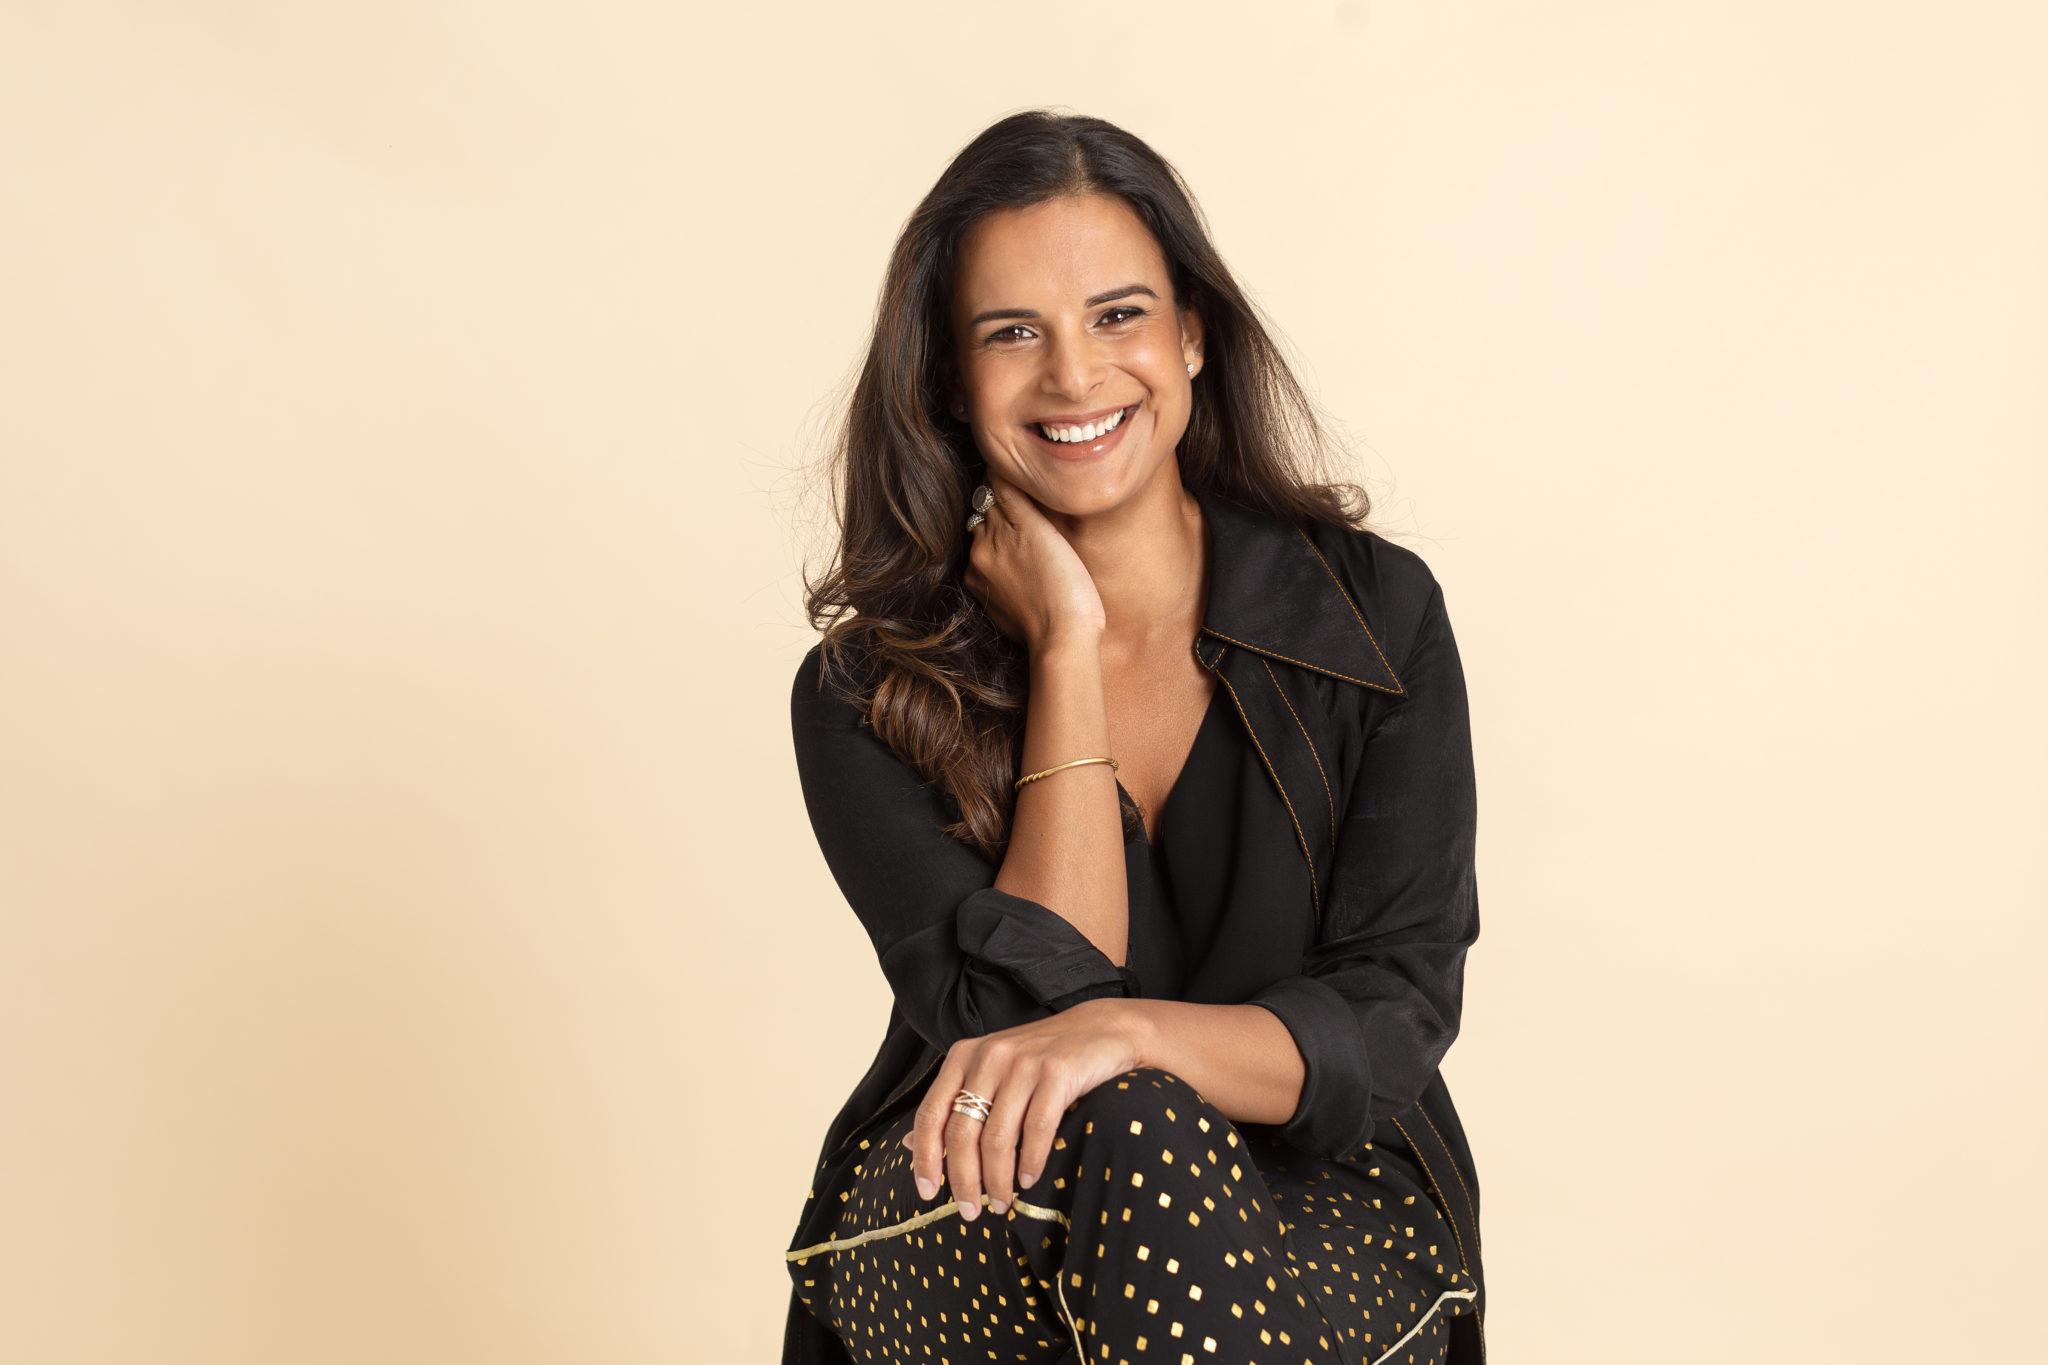 Samantha Fernandes